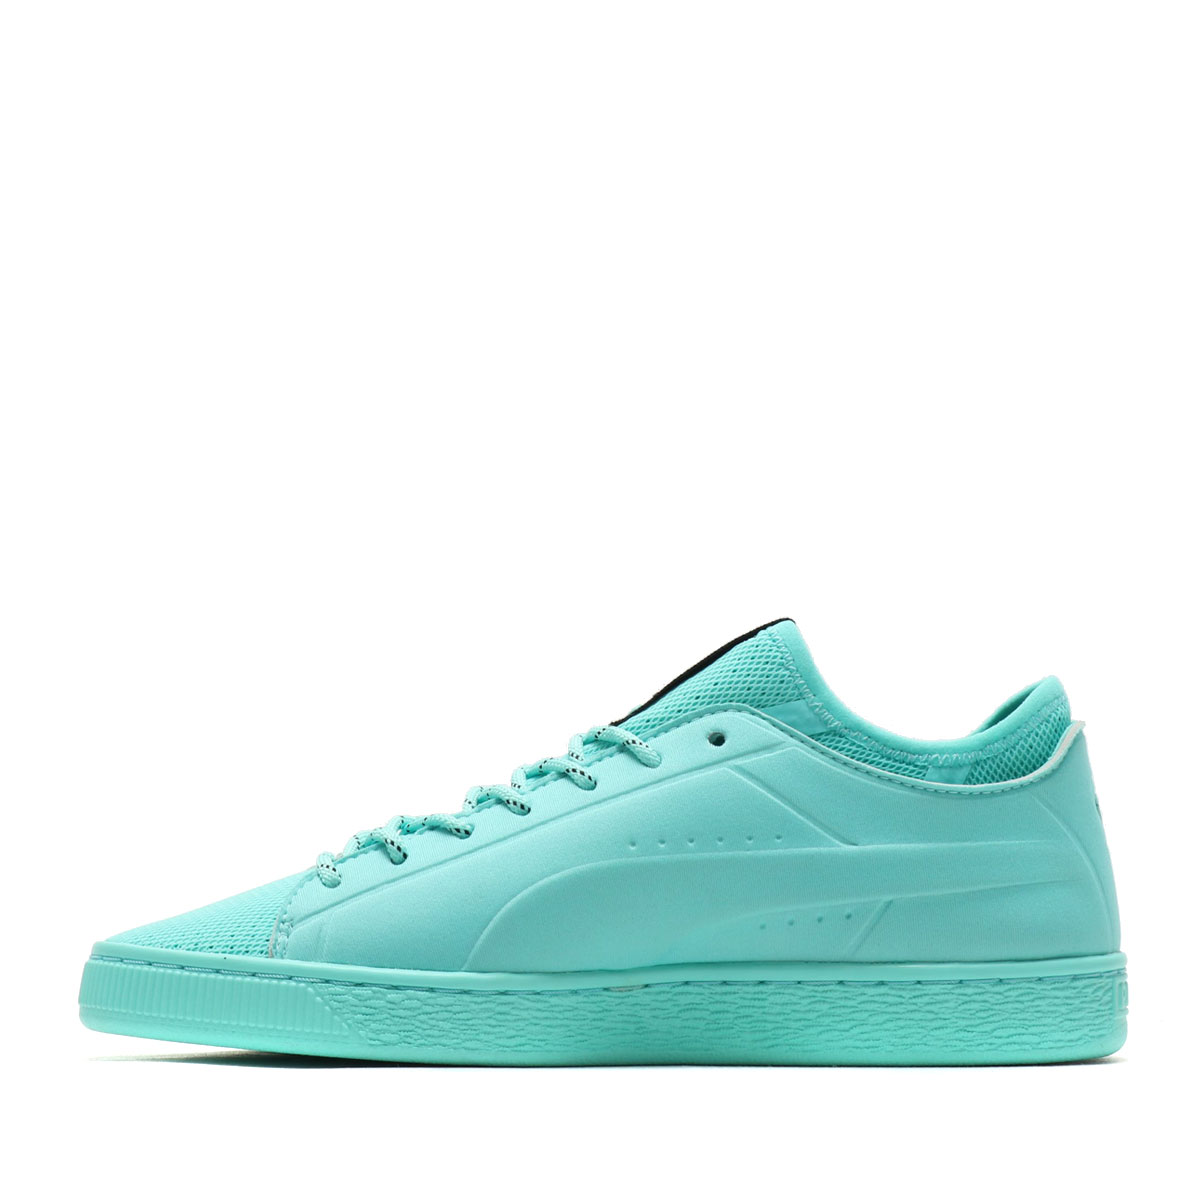 sports shoes db0e1 35e3d PUMA BASKET SOCK LO DIAMOND (プーマバスケットソック LO diamond) (DIAMOND BLUE)